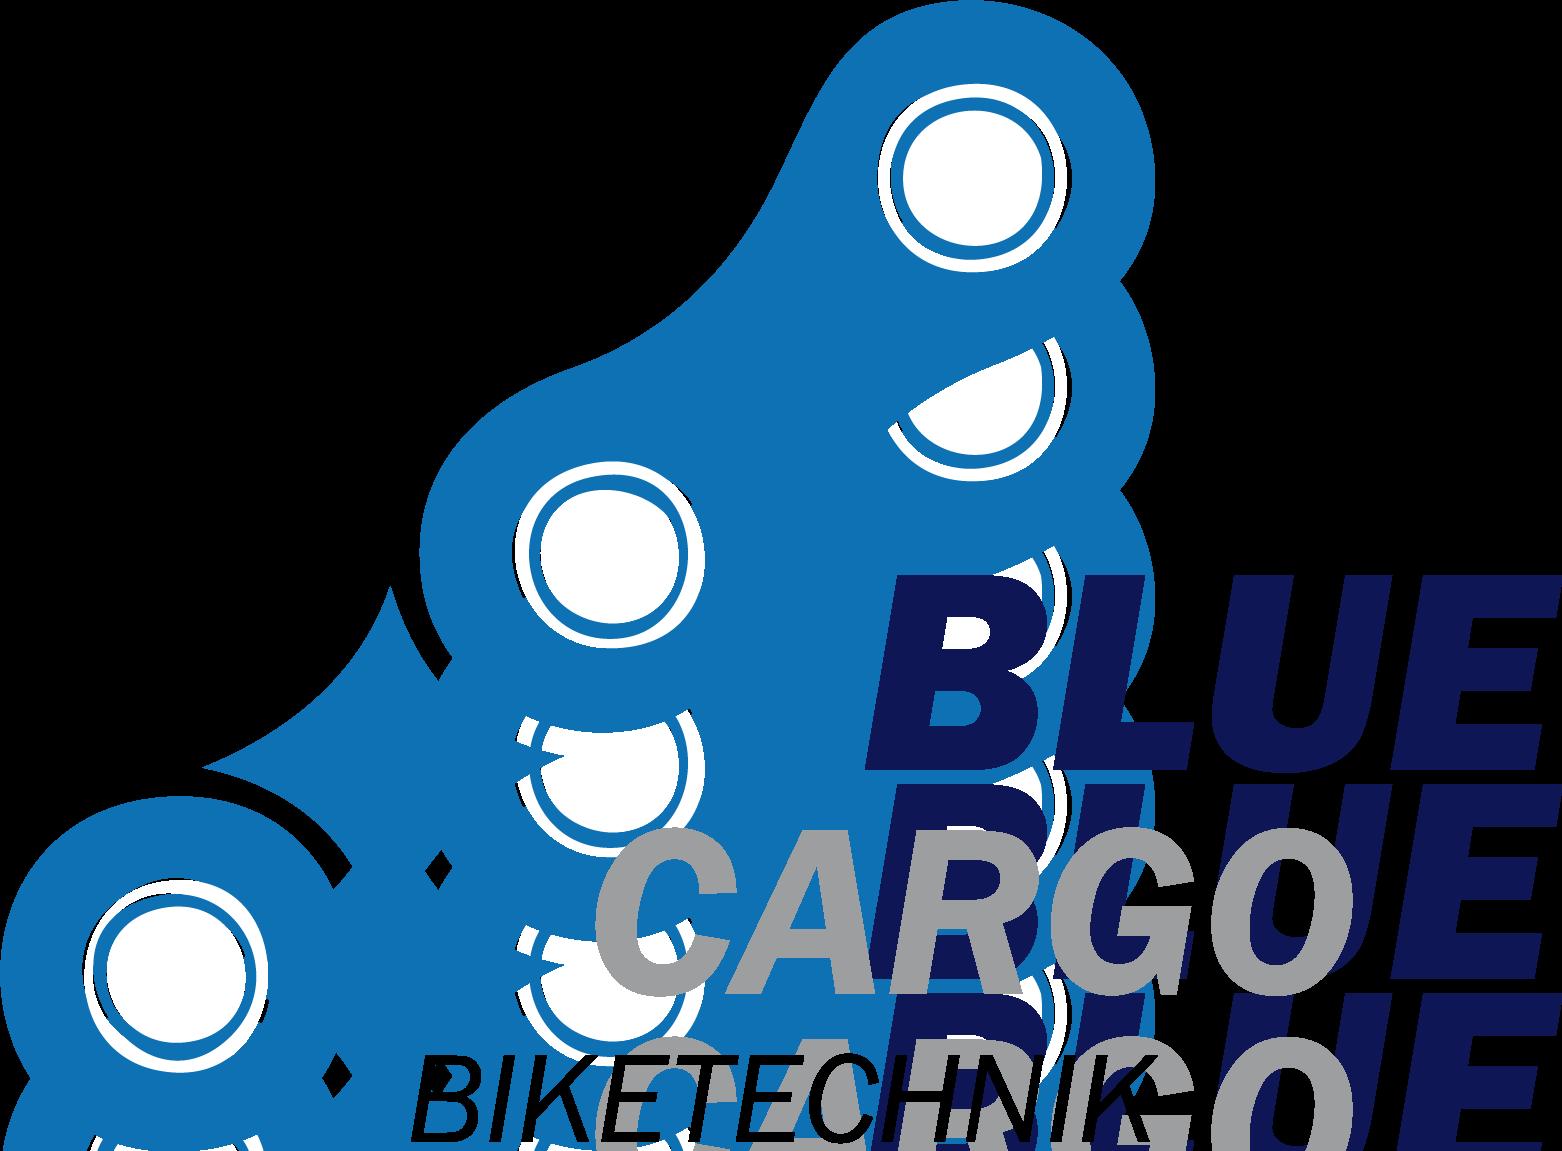 Blue Cargo Biketechnik GmbH